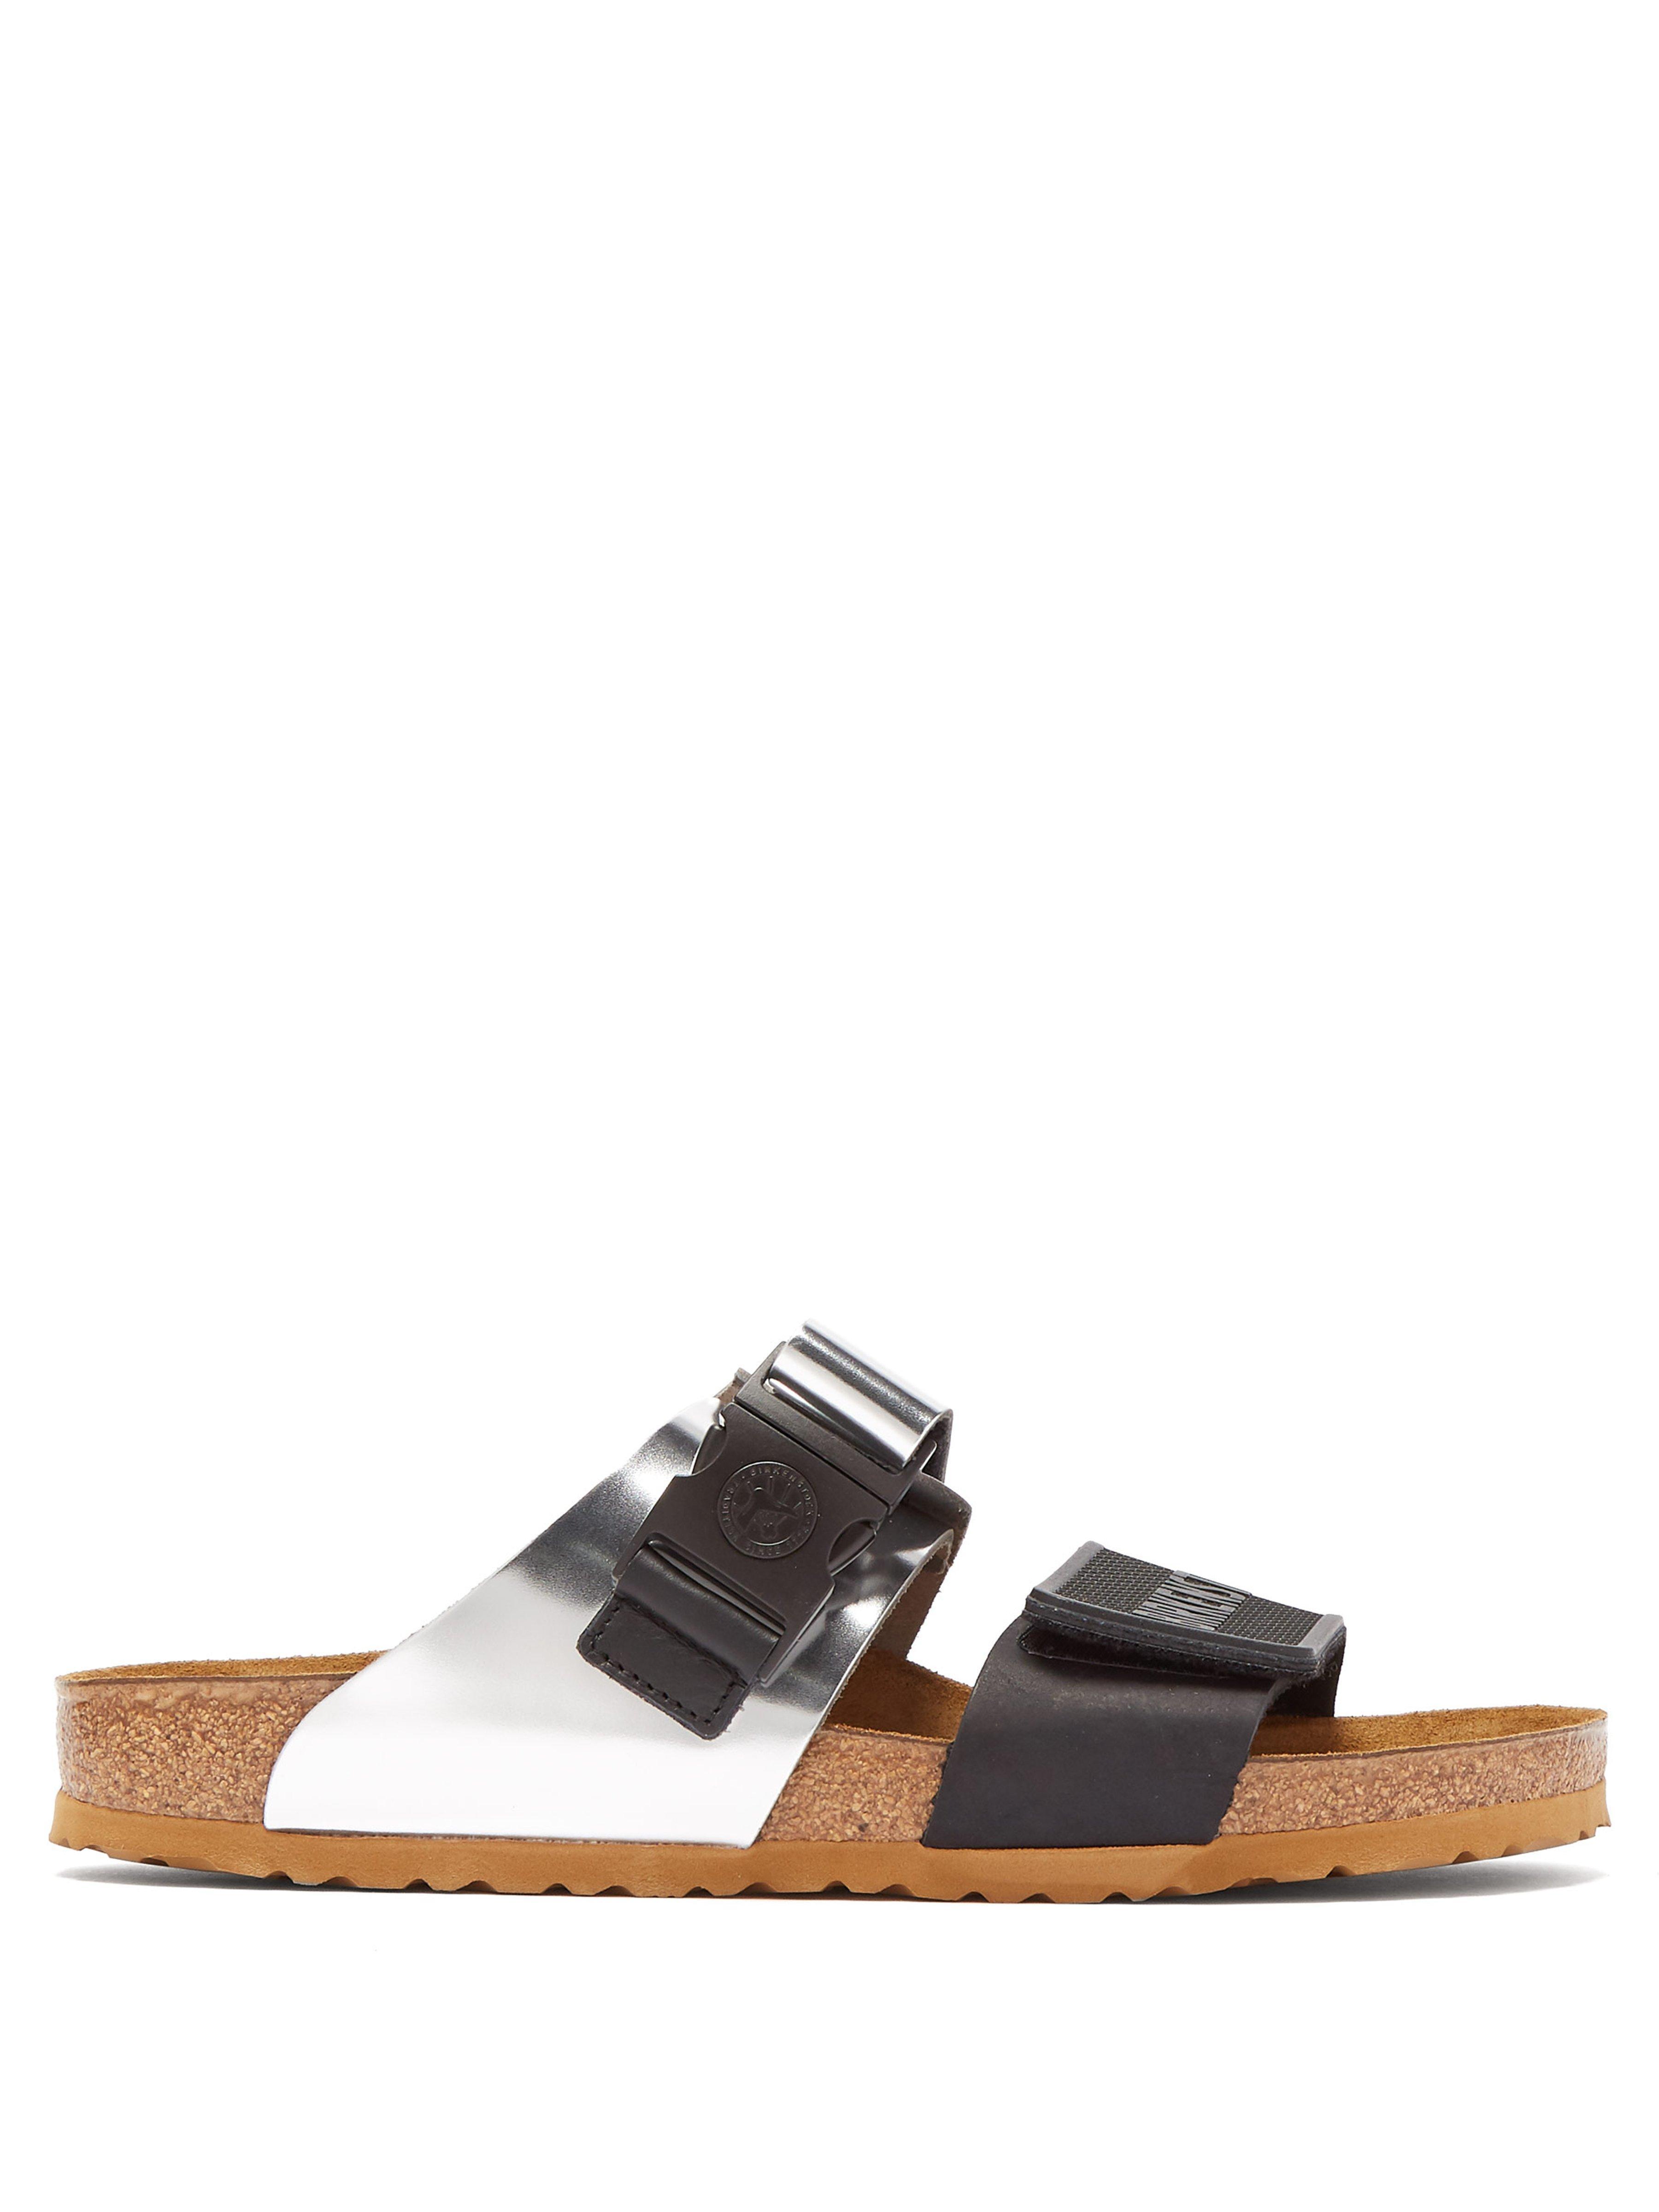 93c4d70bfab4 Rick Owens X Birkenstock Arizona Leather Sandals for Men - Lyst